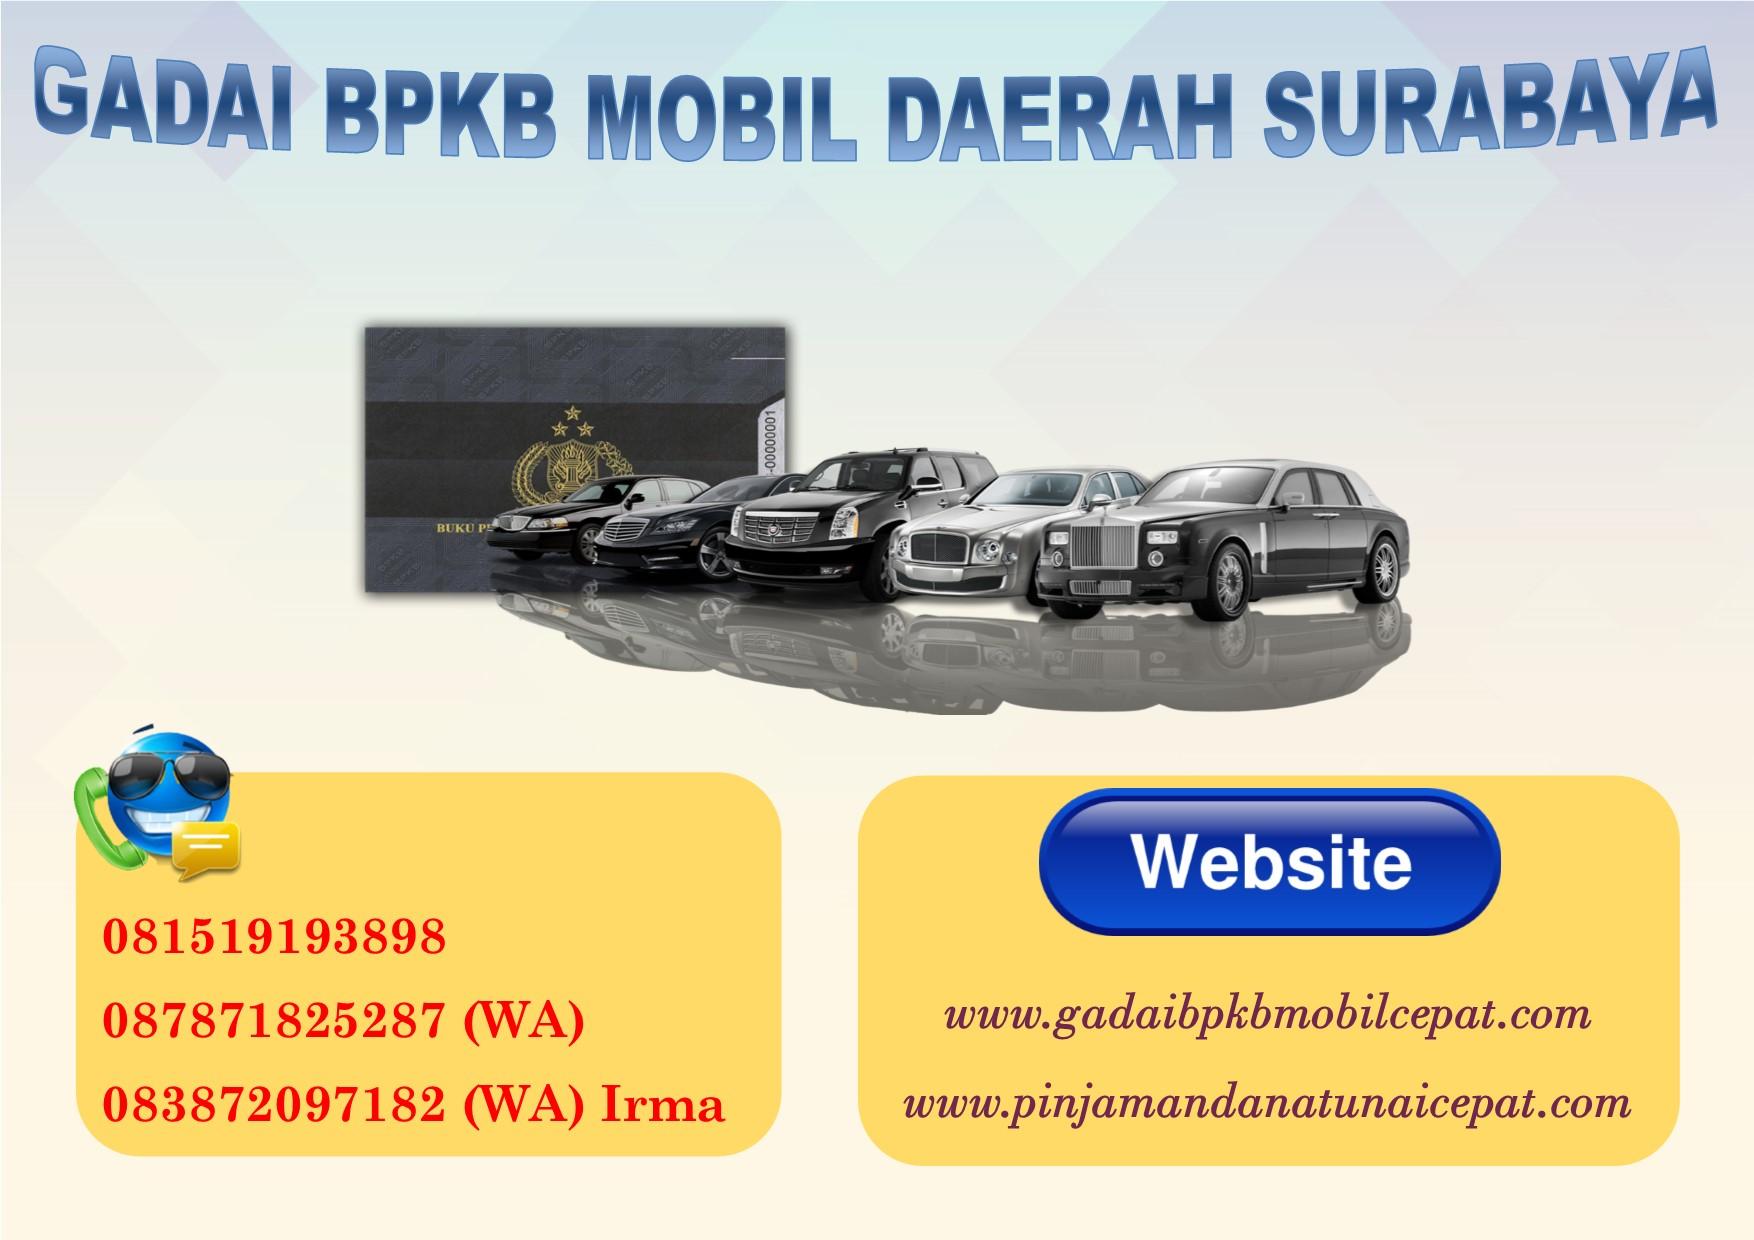 gadai BPKB mobil daerah Surabaya